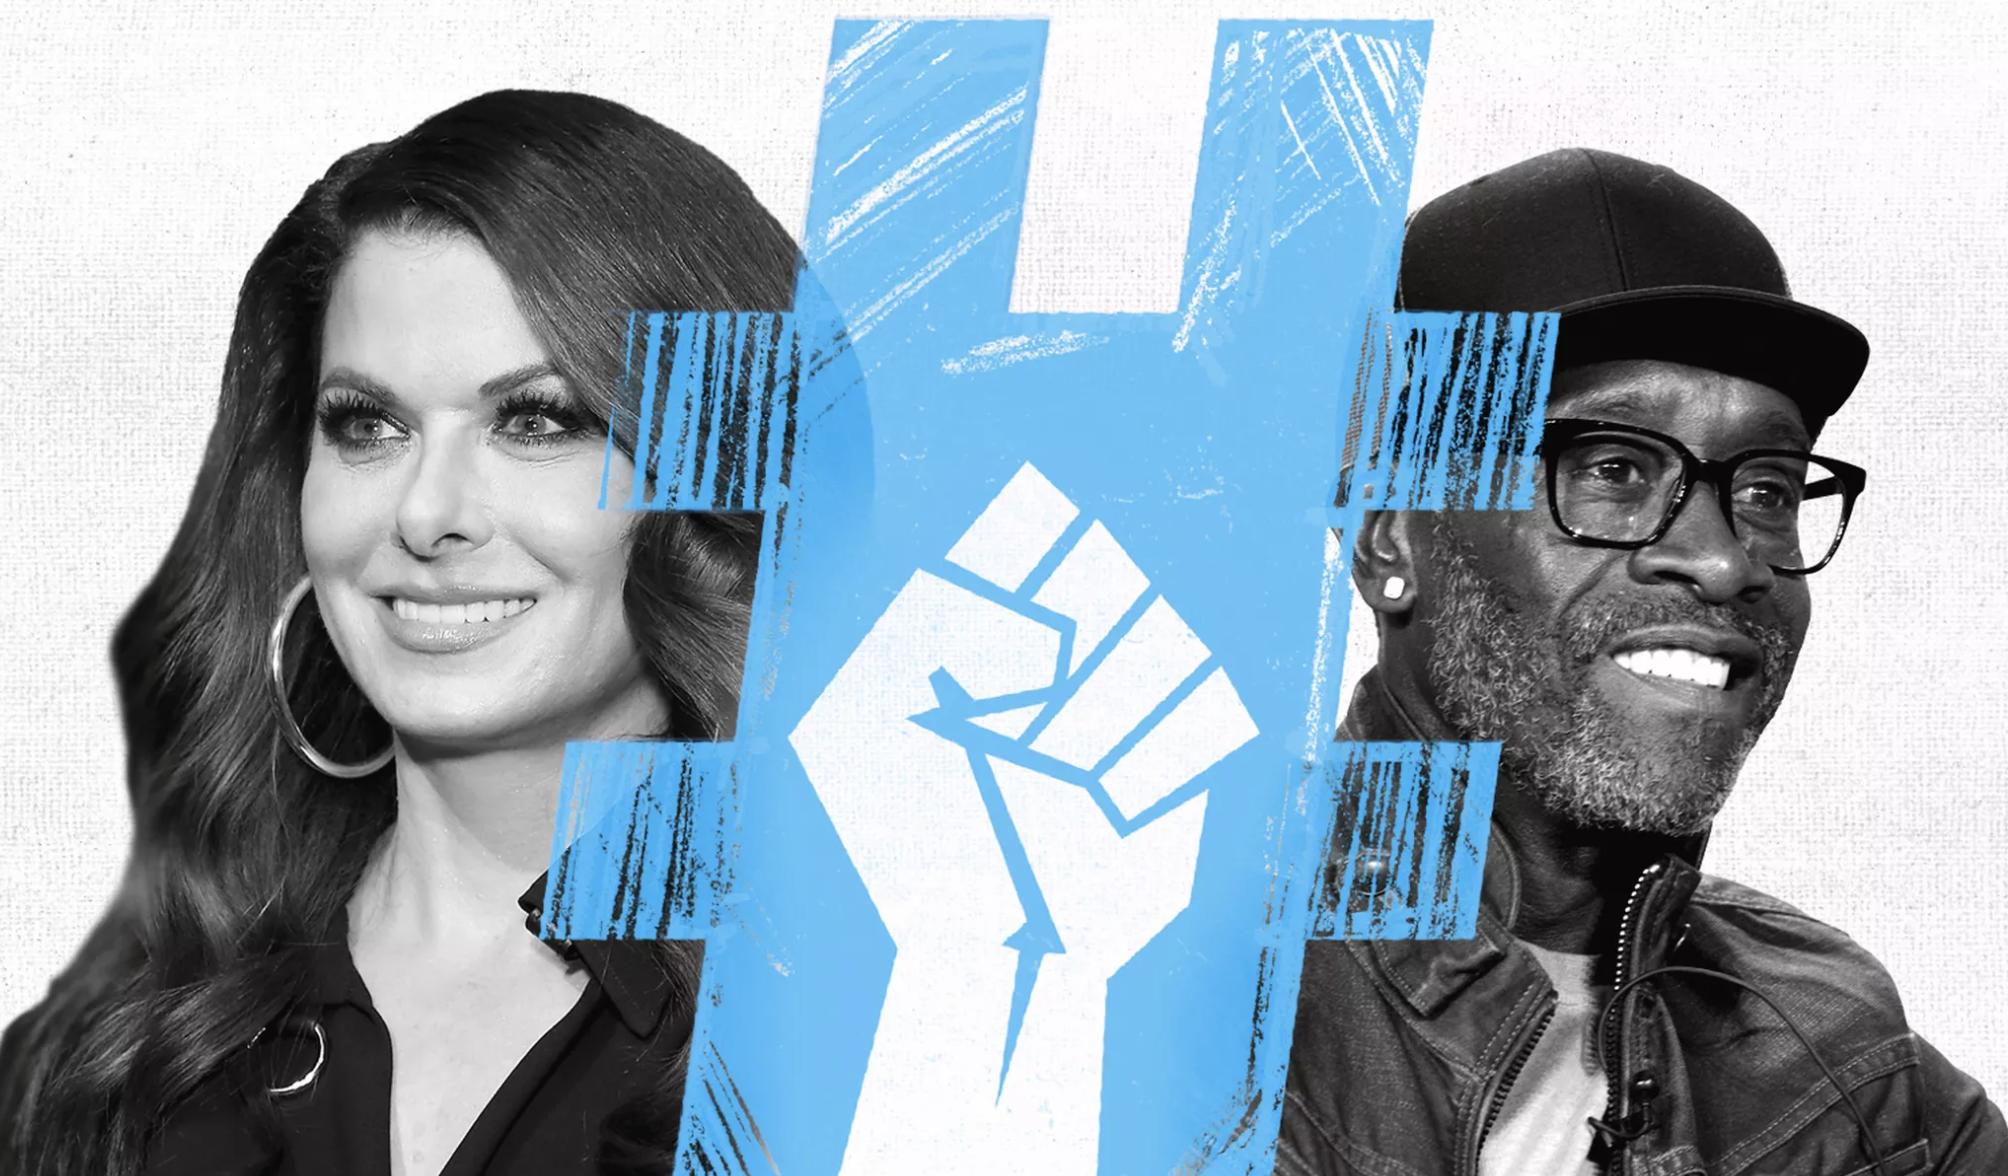 Inside The Secret Twitter Rooms Where The Celebrity #Resistance Organizes